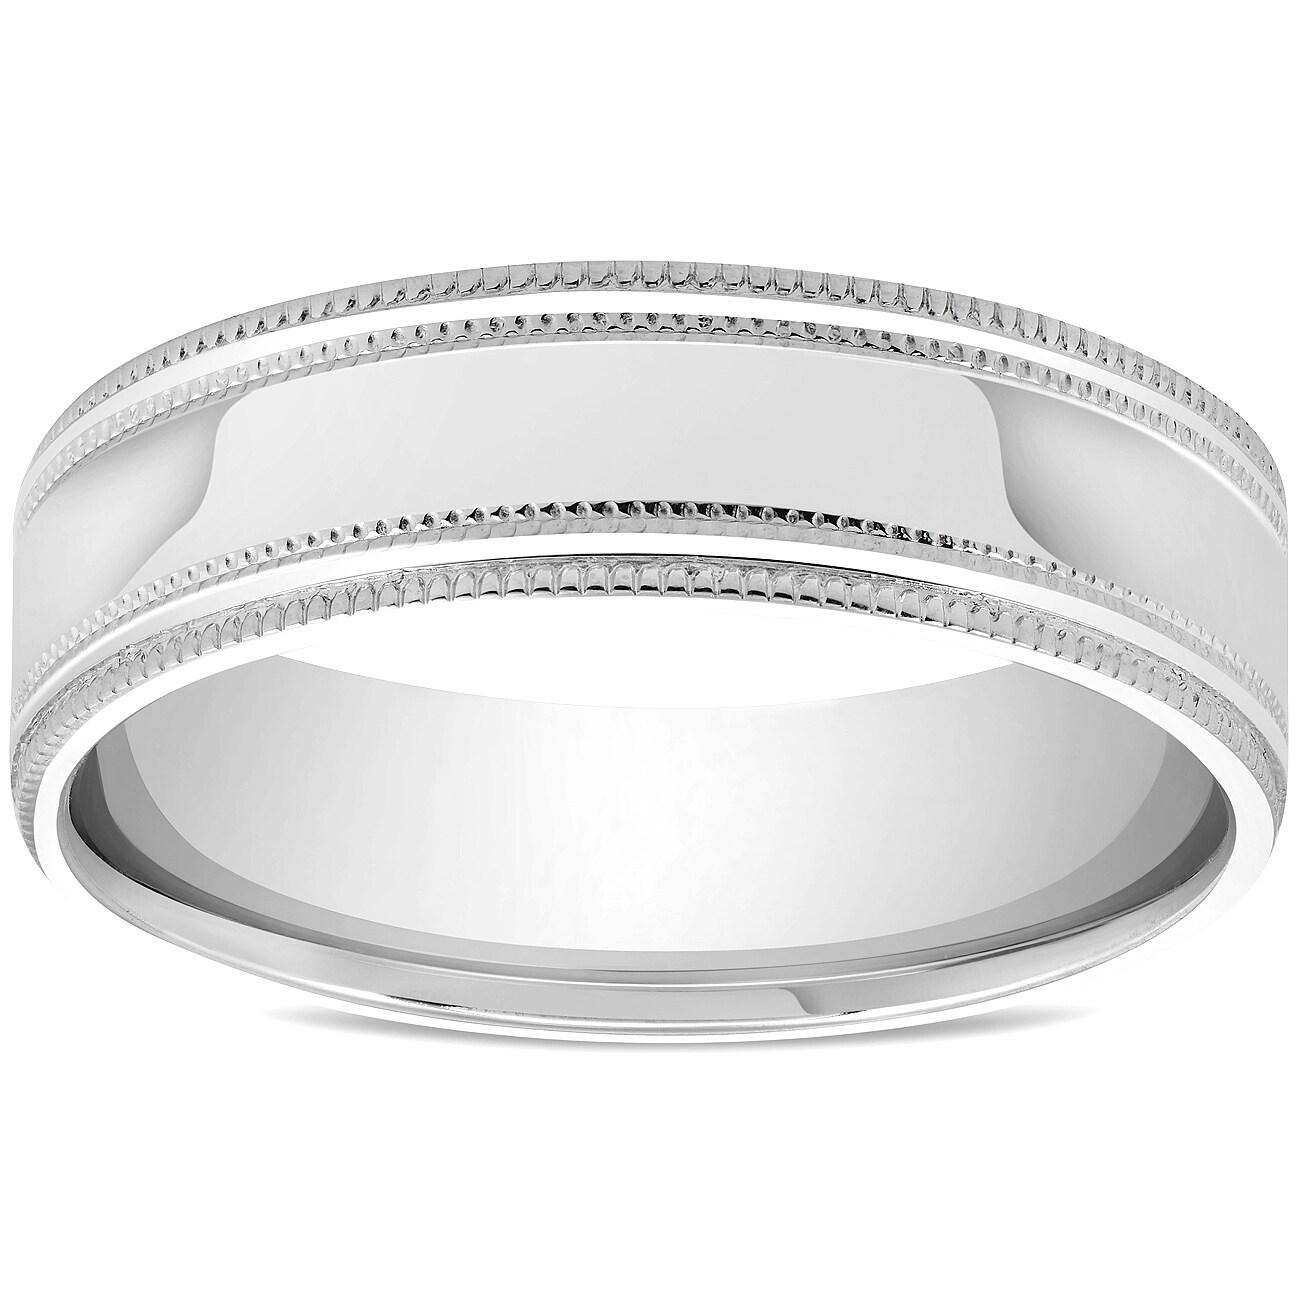 14k Solid White Gold 6mm High Polish Milgrain Wedding Band Ring Size 8